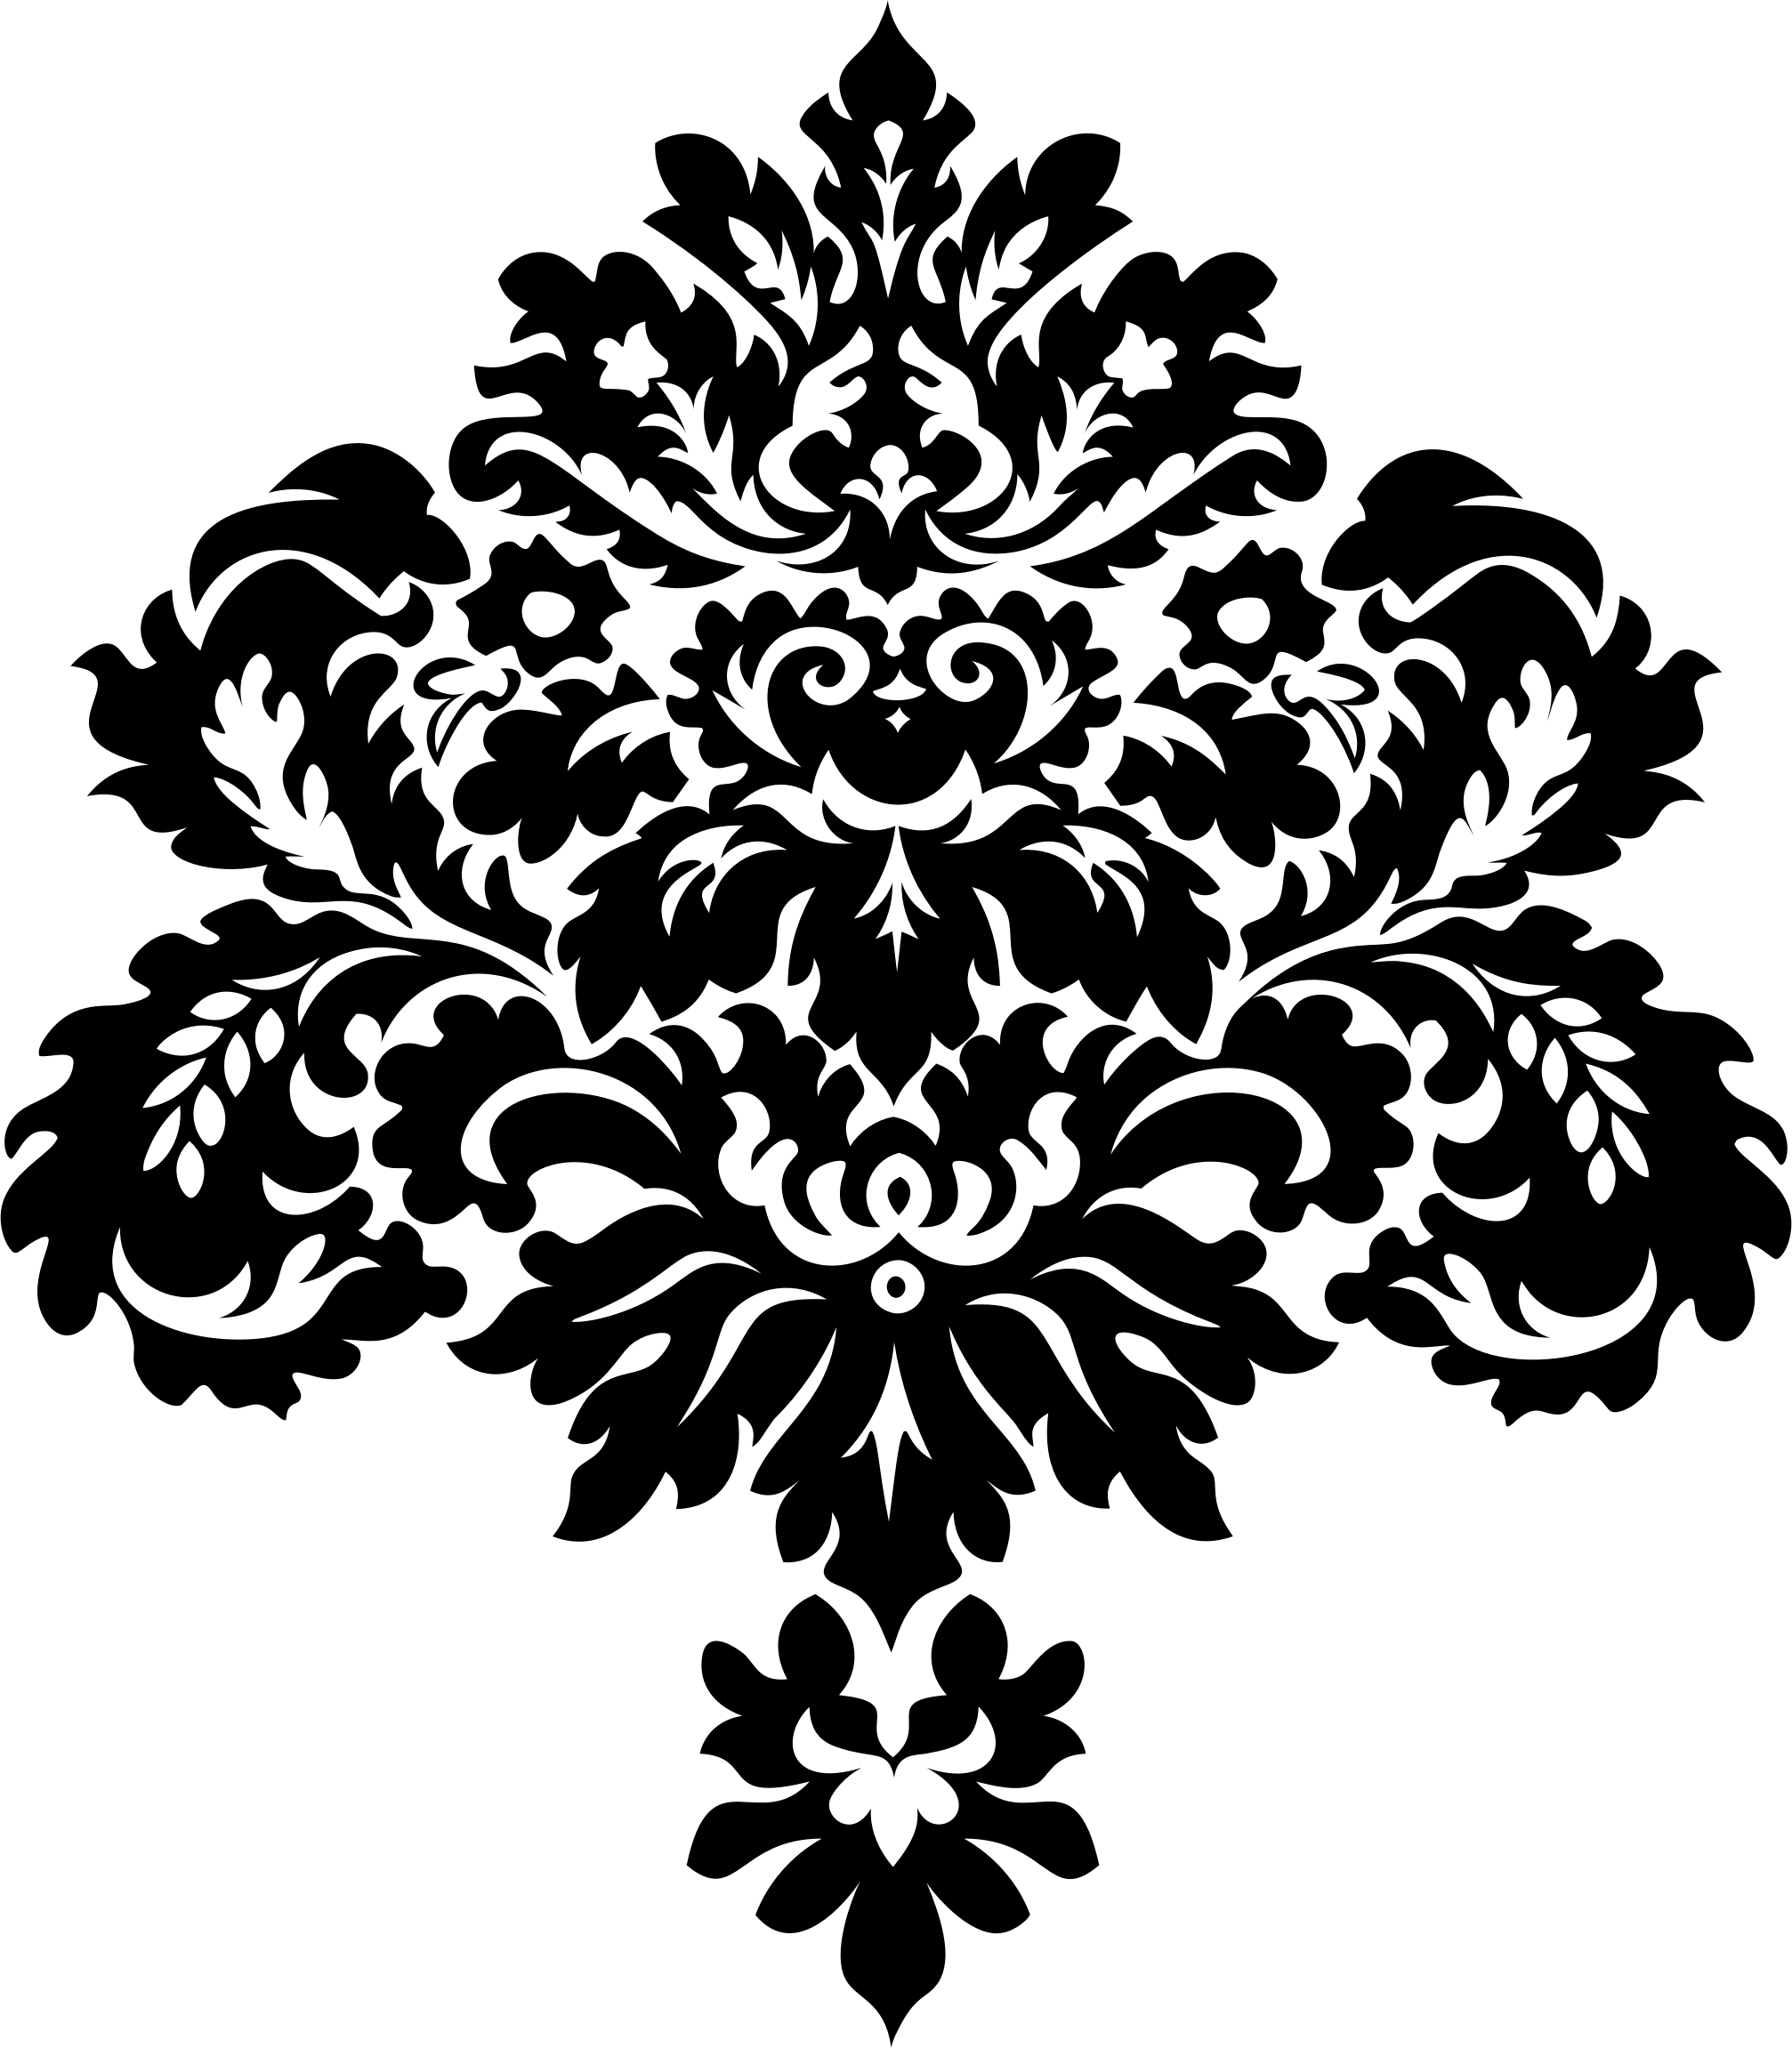 clipart damask design silhouette